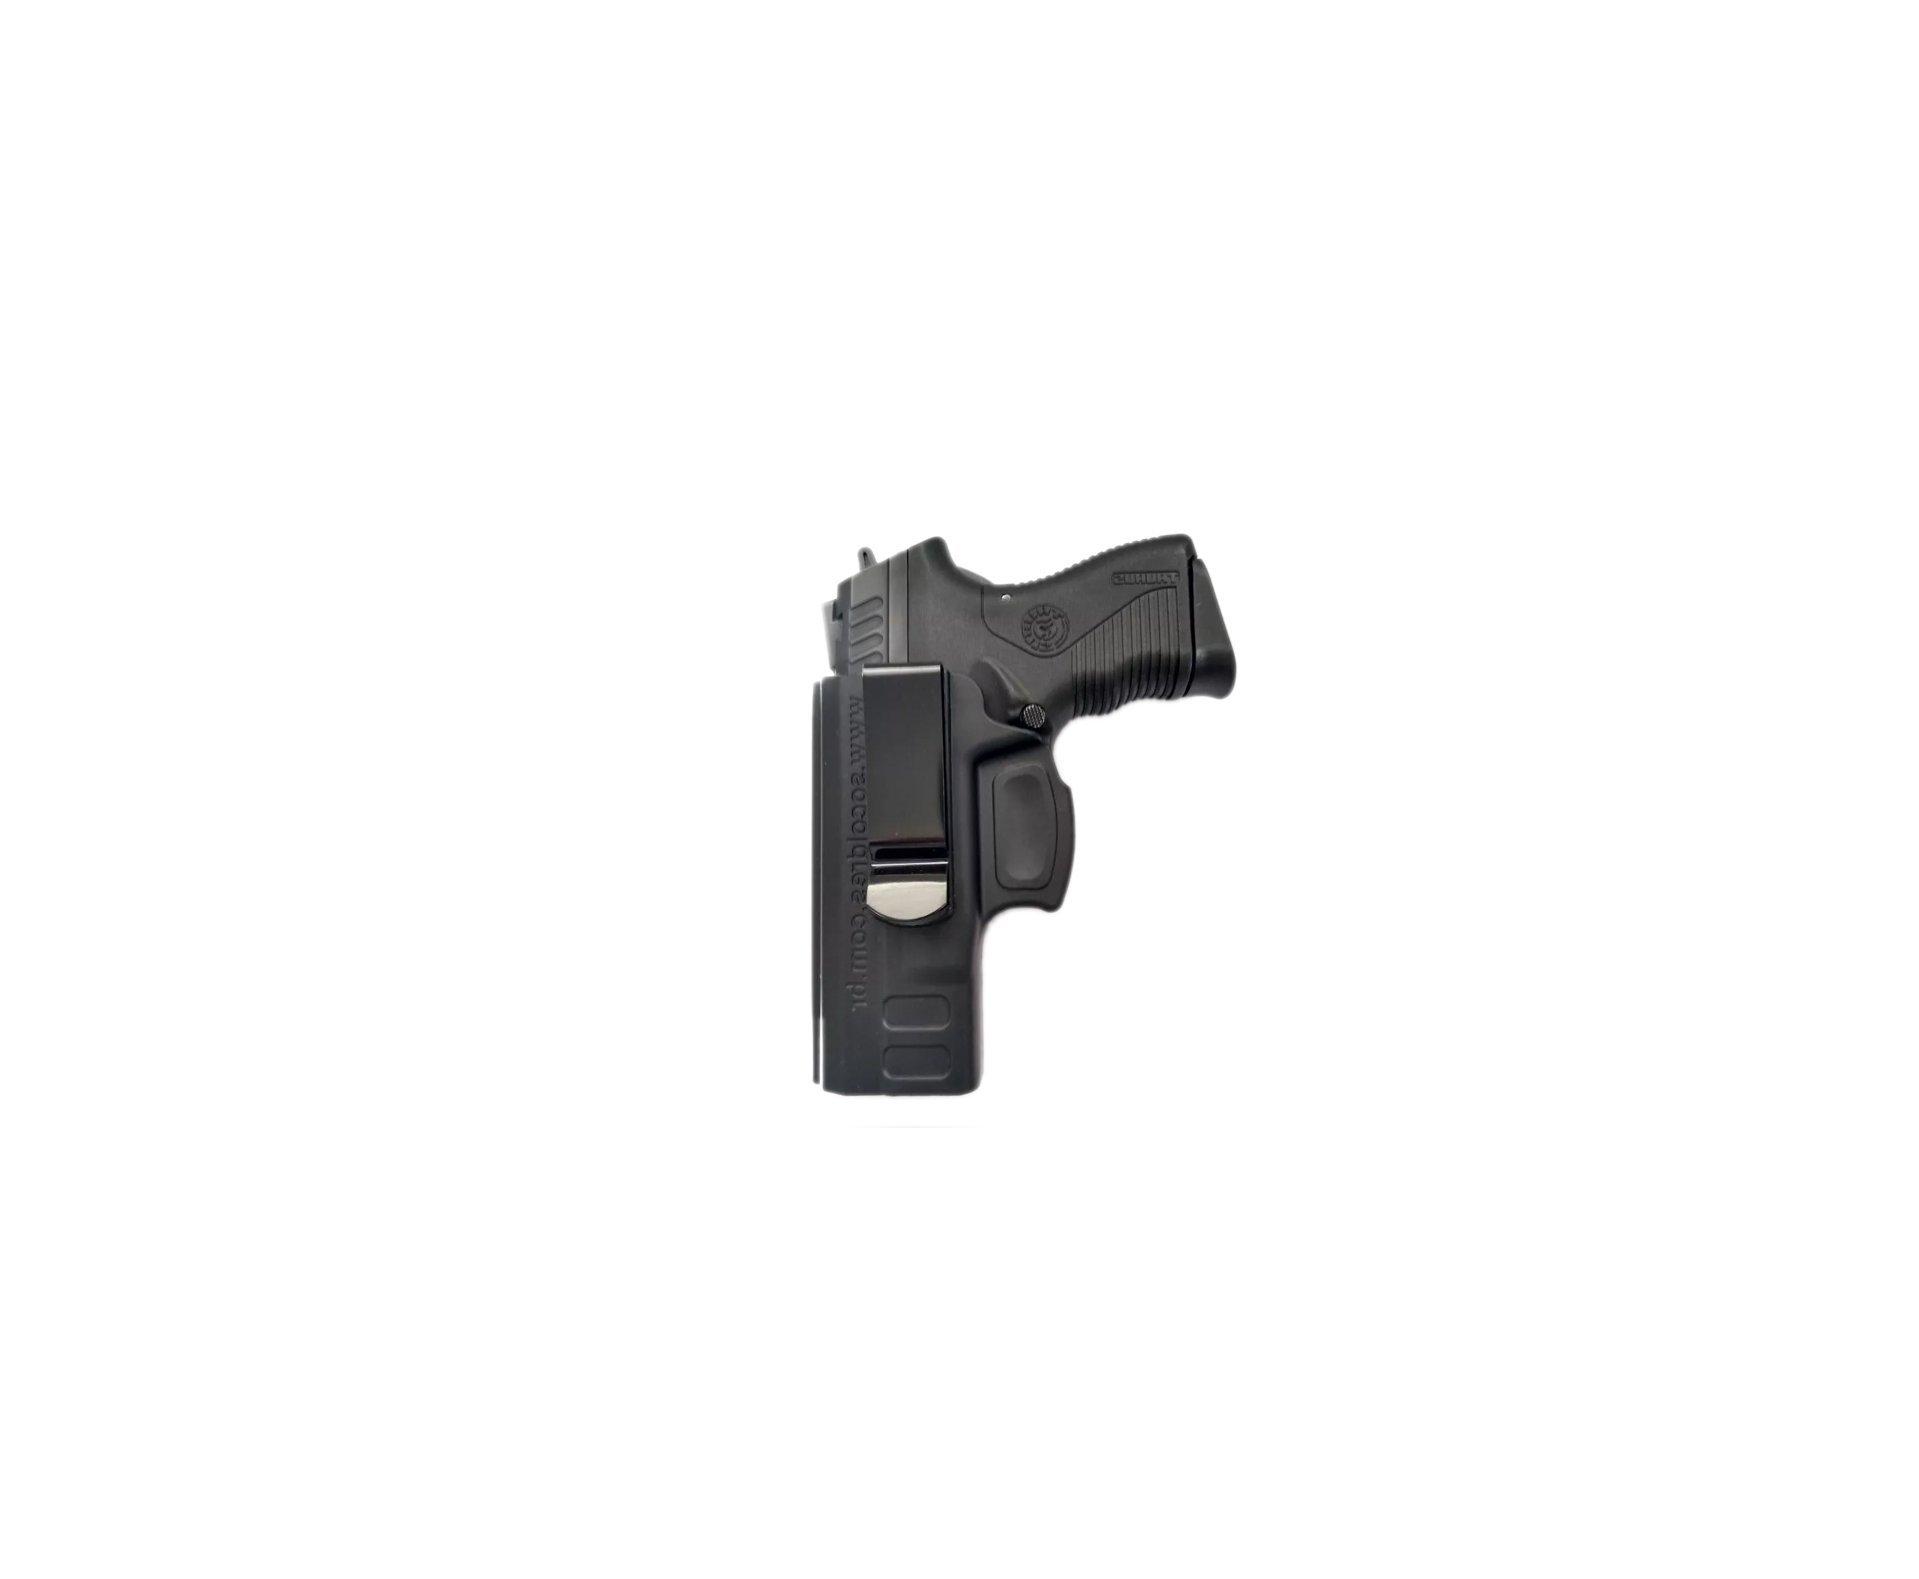 Coldre Velado Pistola Taurus Pt838c, 809, 840 Canhoto So Coldres